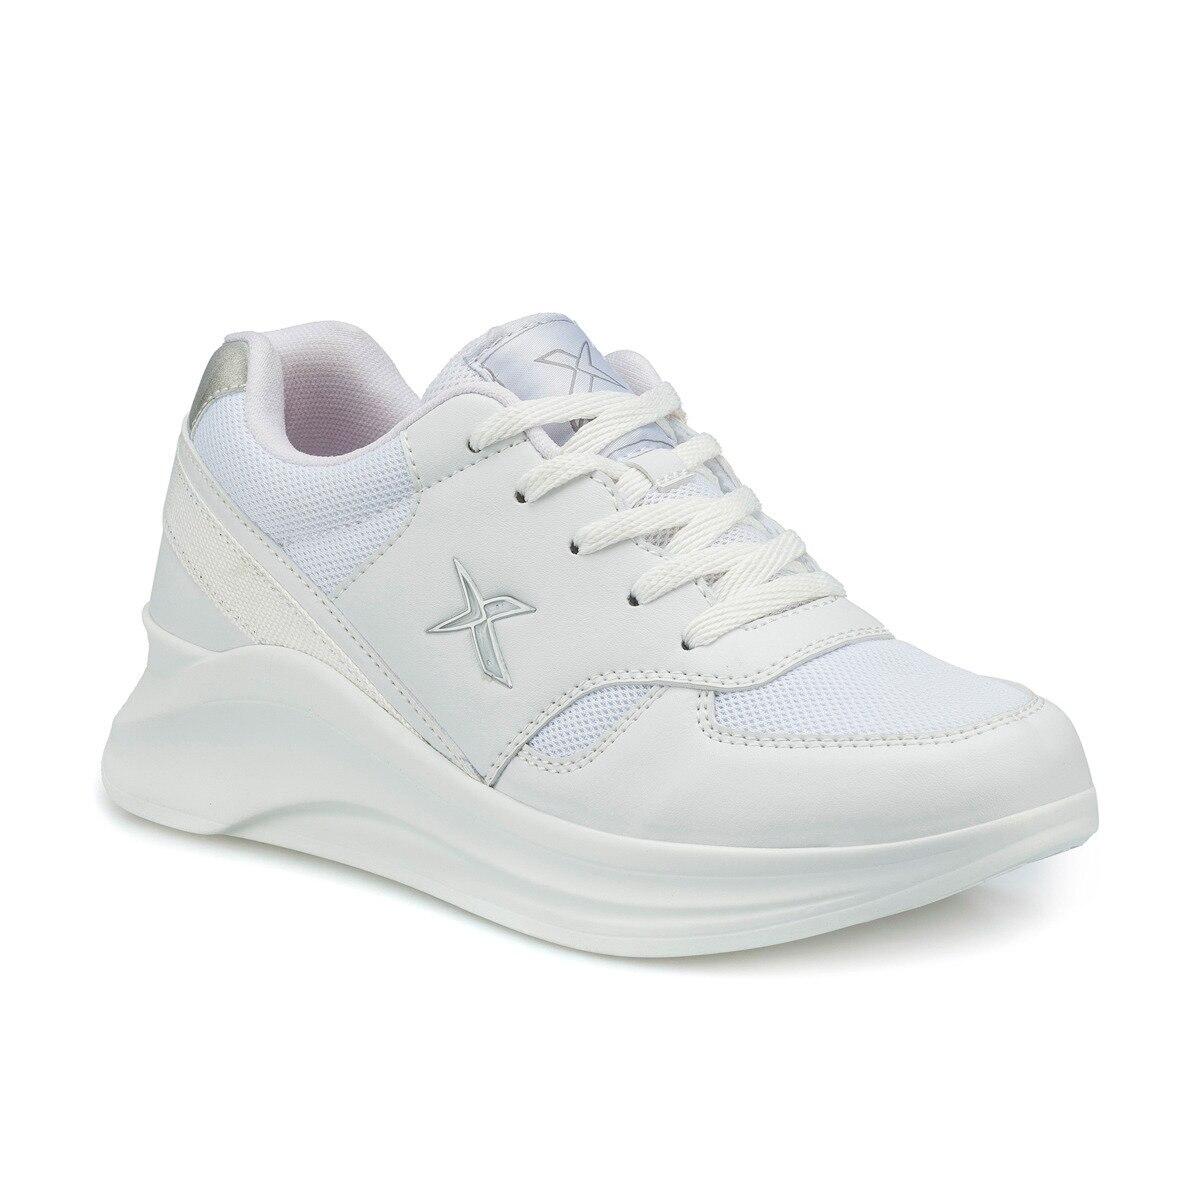 FLO MILO MESH W White Women 'S Sneaker Shoes KINETIX